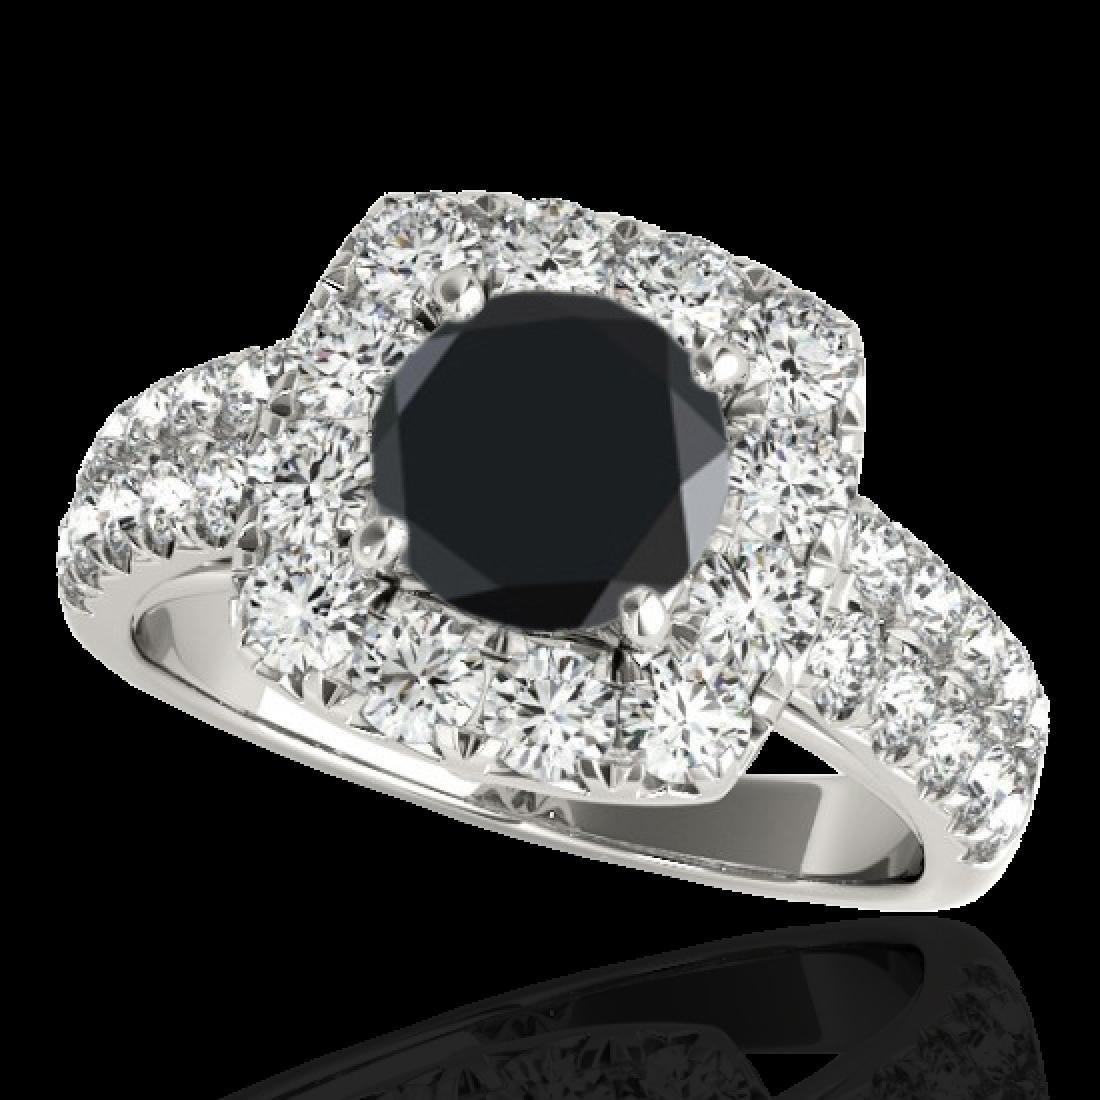 2.5 CTW Certified VS Black Diamond Solitaire Halo Ring